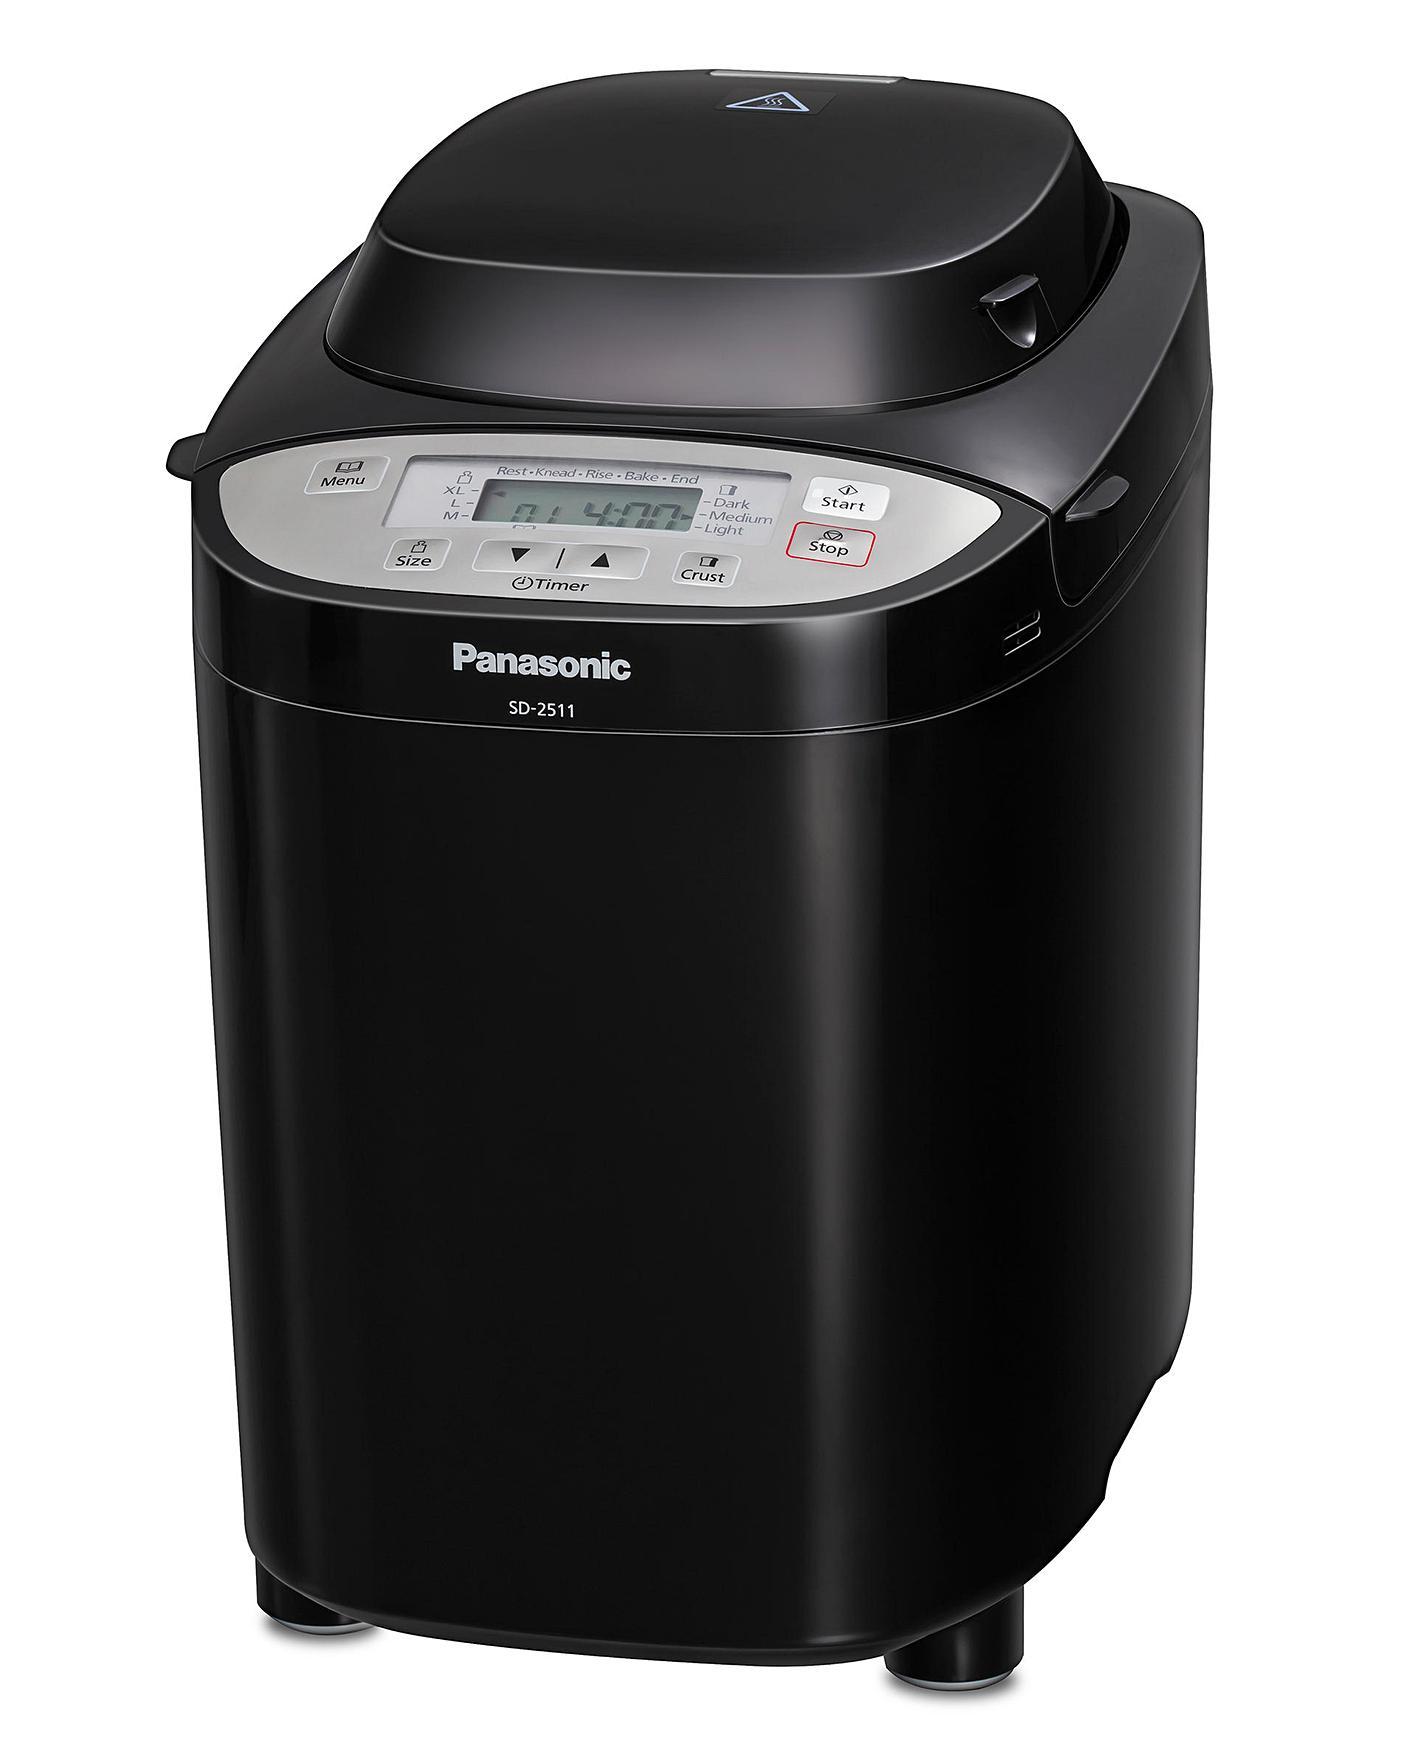 Panasonic SD2511 Black Breadmaker with Raisin and Nut Dispenser £127.40 at Ambrose Wilson